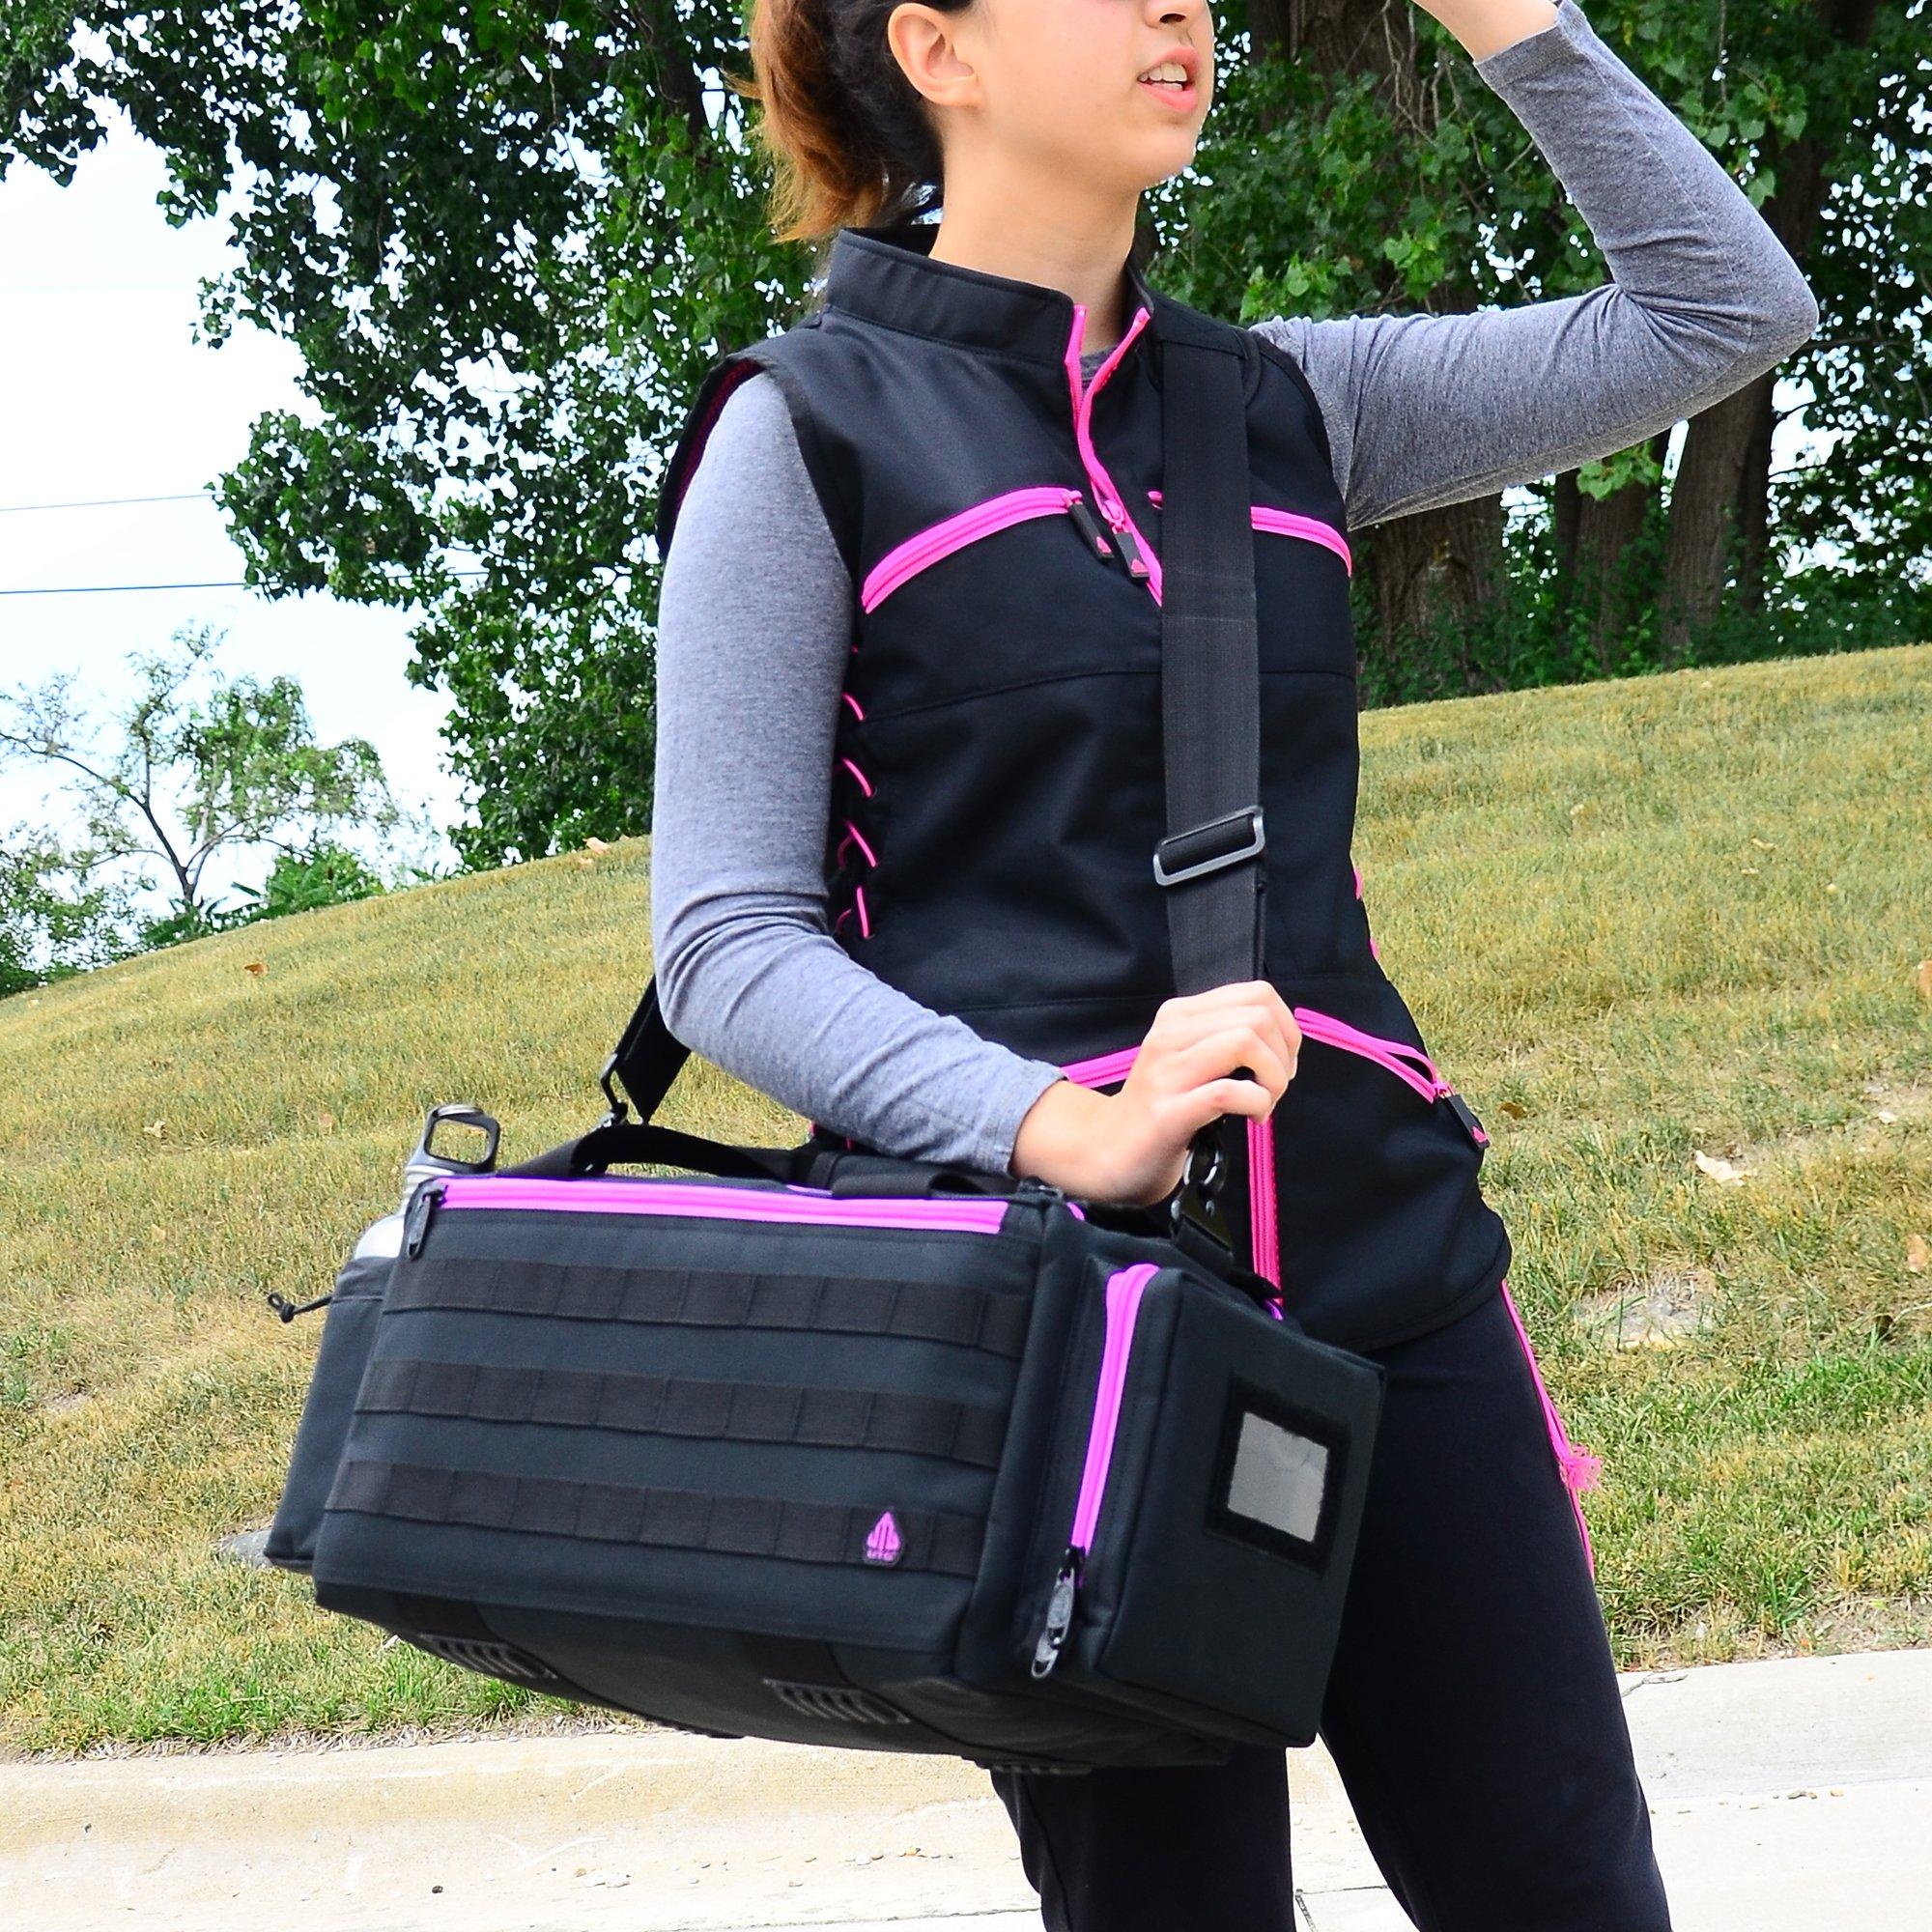 UTG All in One Range/Utility Go Bag, Black/Violet, 21'' x 10'' x 9'' by UTG (Image #3)